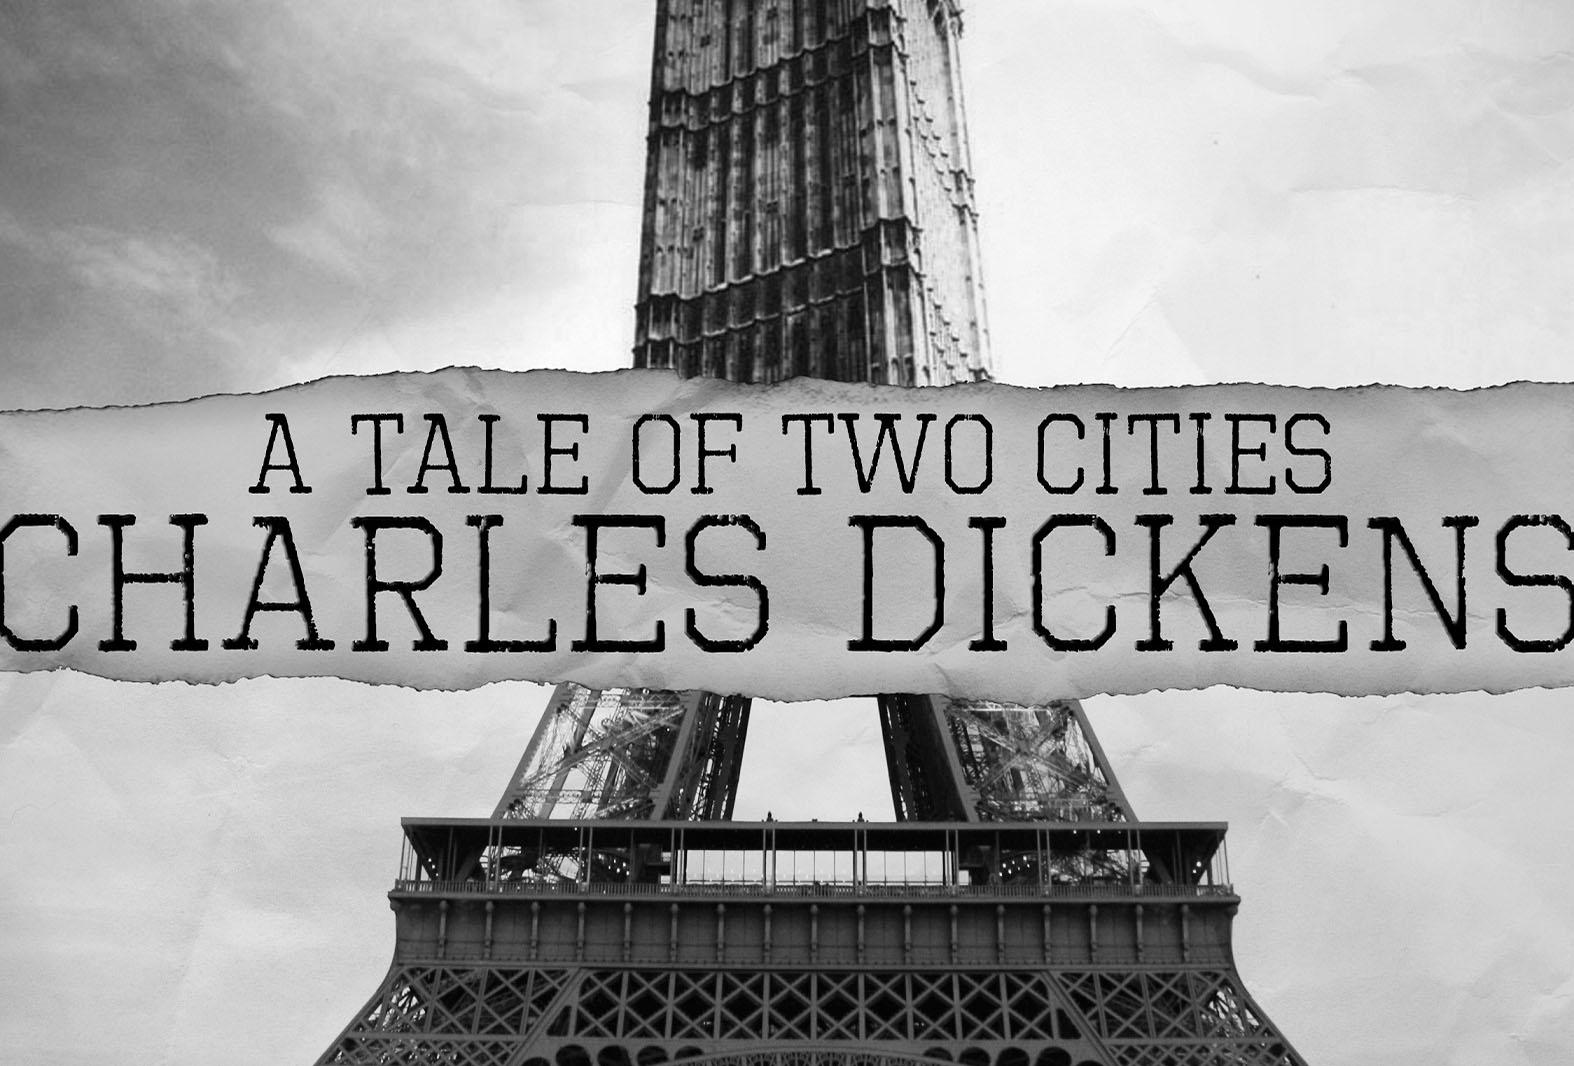 Tale-of-Two-Cities-FI.jpg